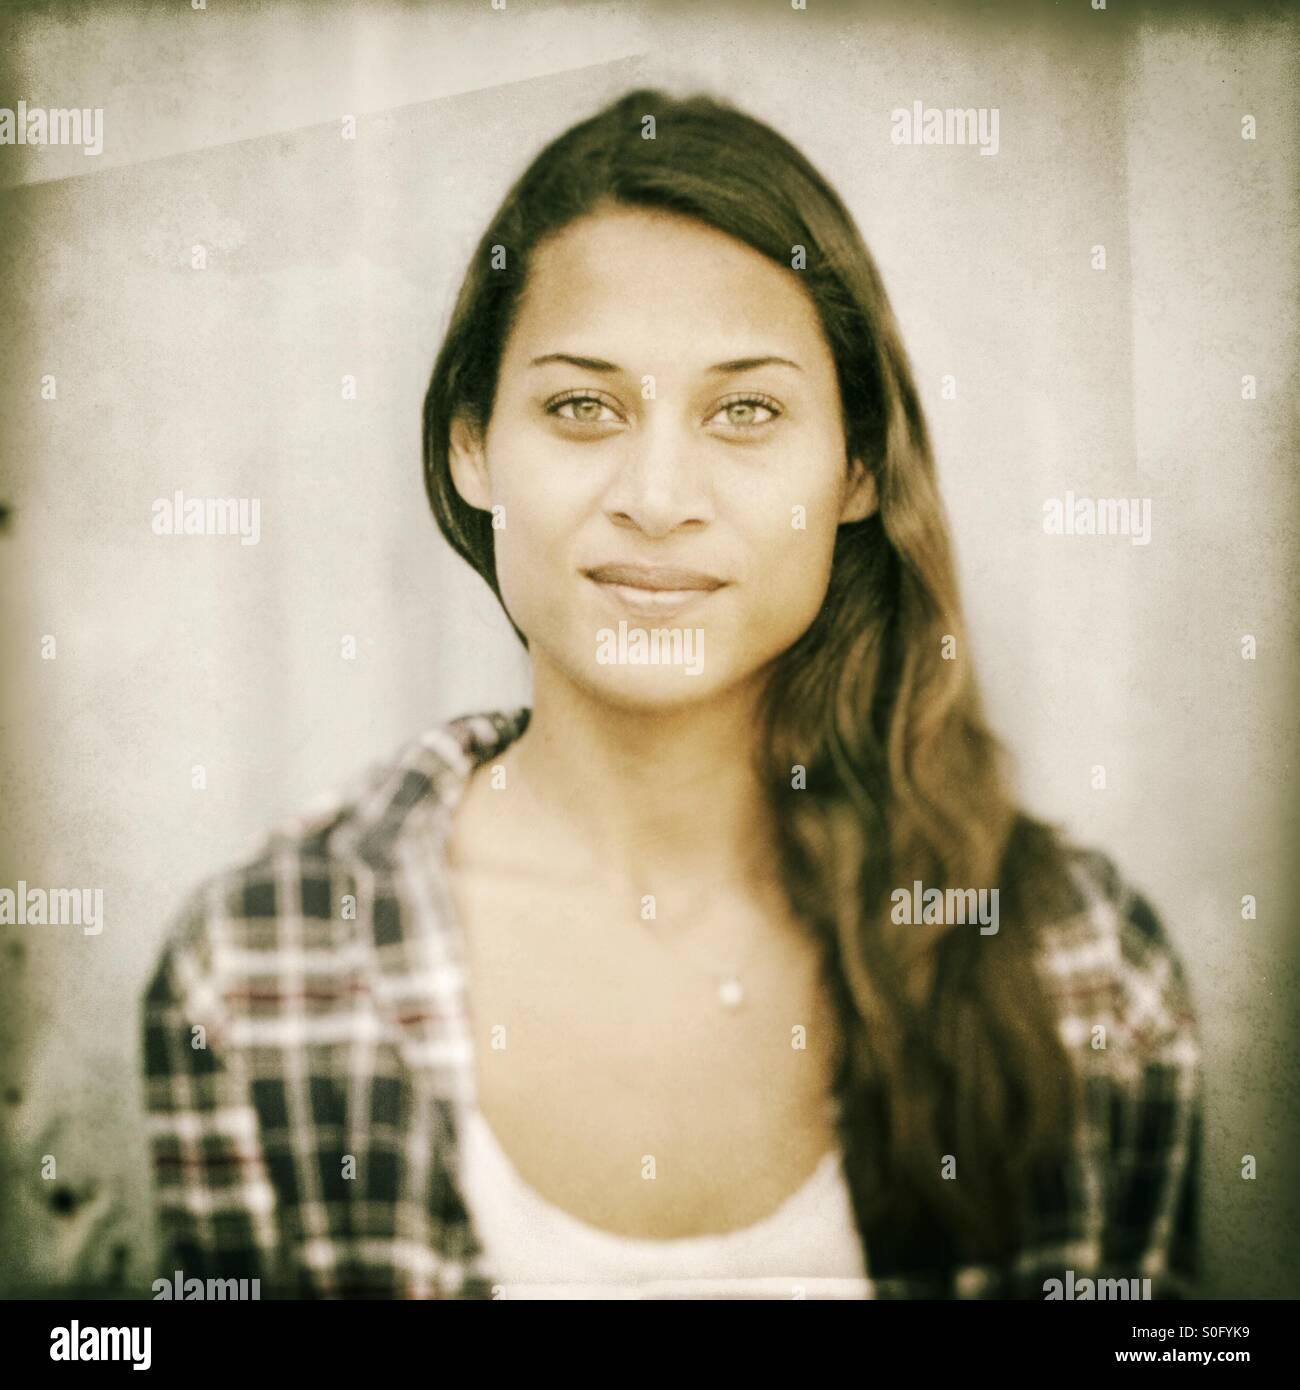 Portrait of a beautiful woman. Stock Photo